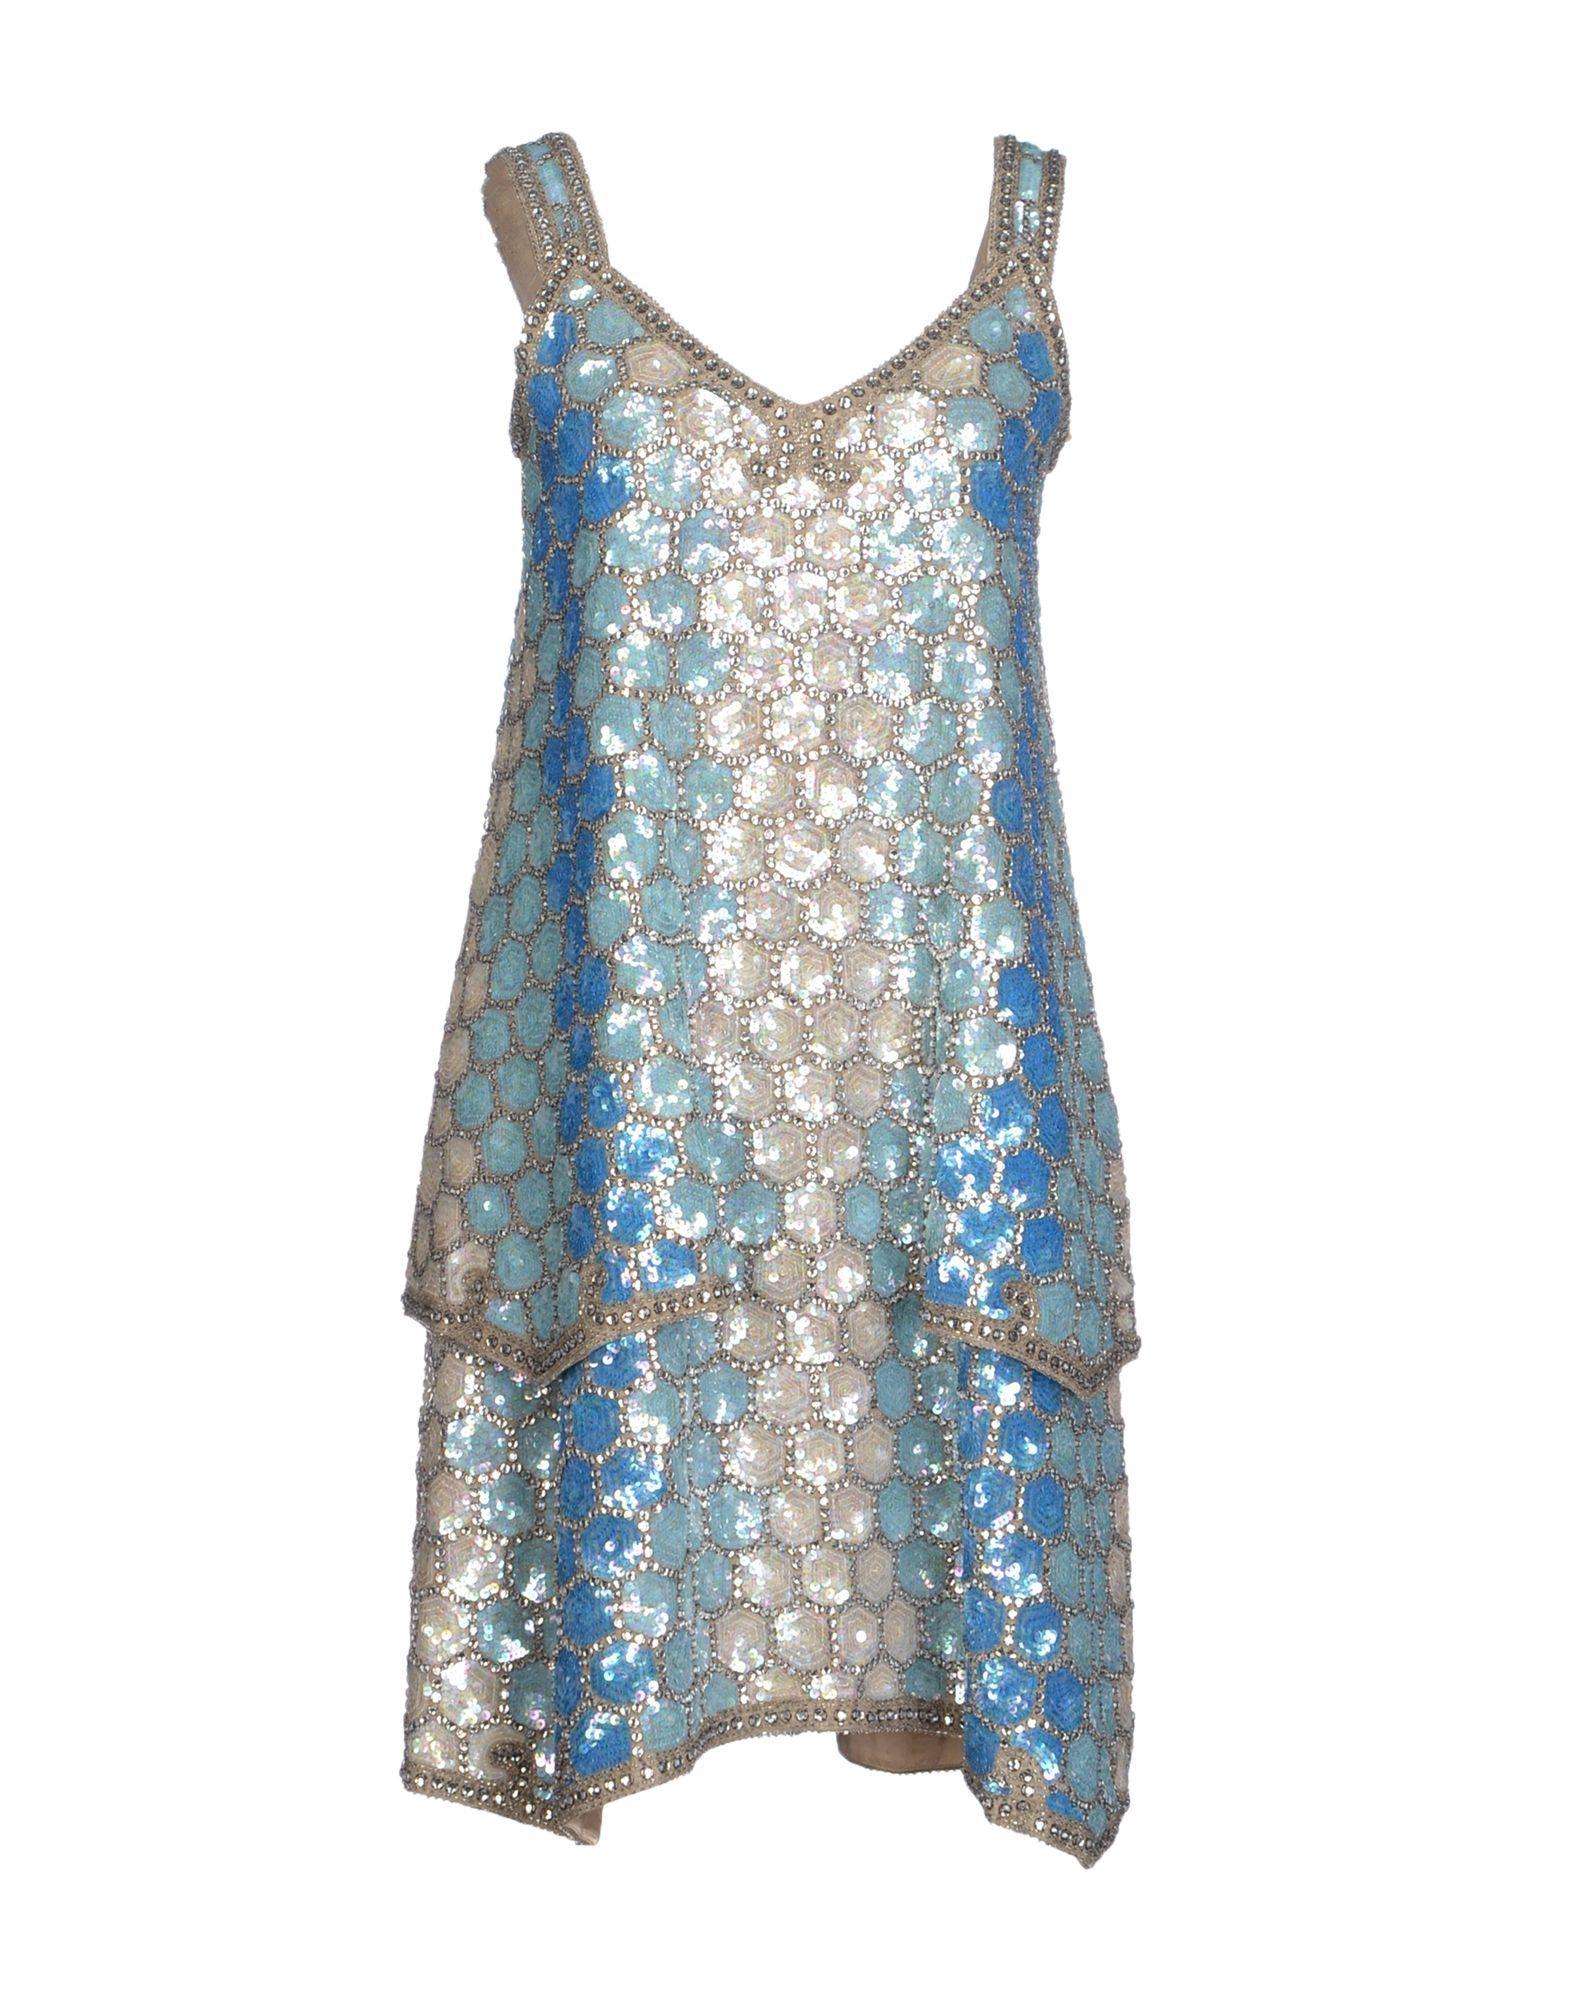 Shop this maison margiela short dress here ue yooxxfmlao